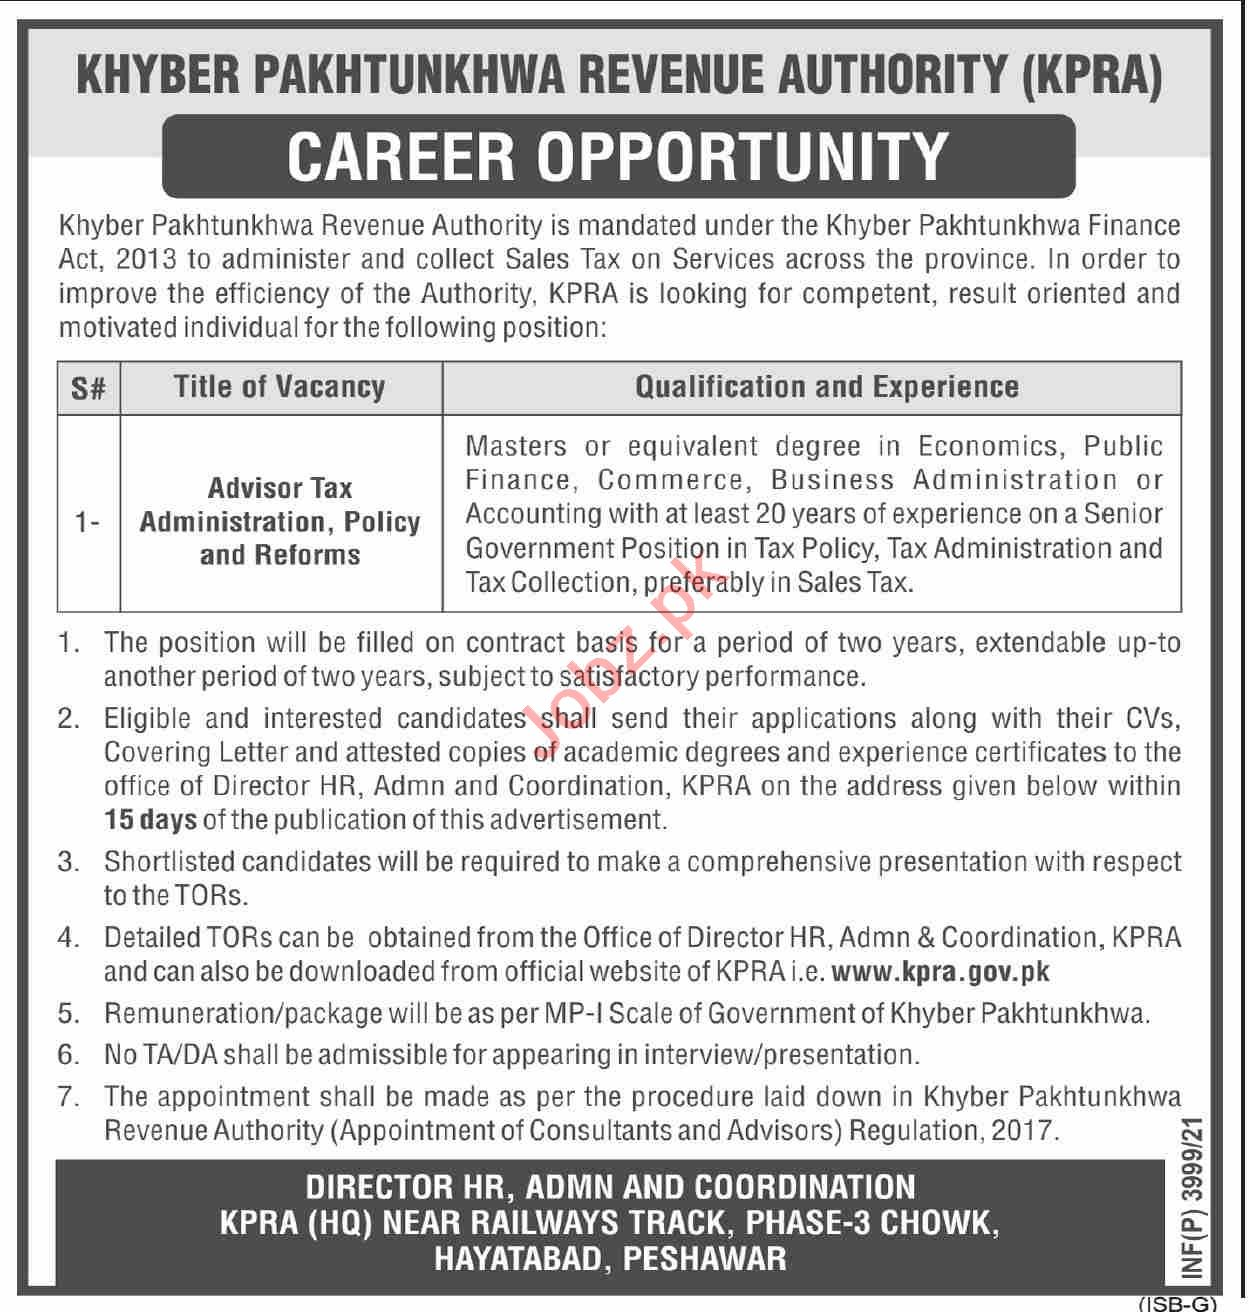 Jobs in Khyber Pakhtunkhwa Revenue Authority KPRA